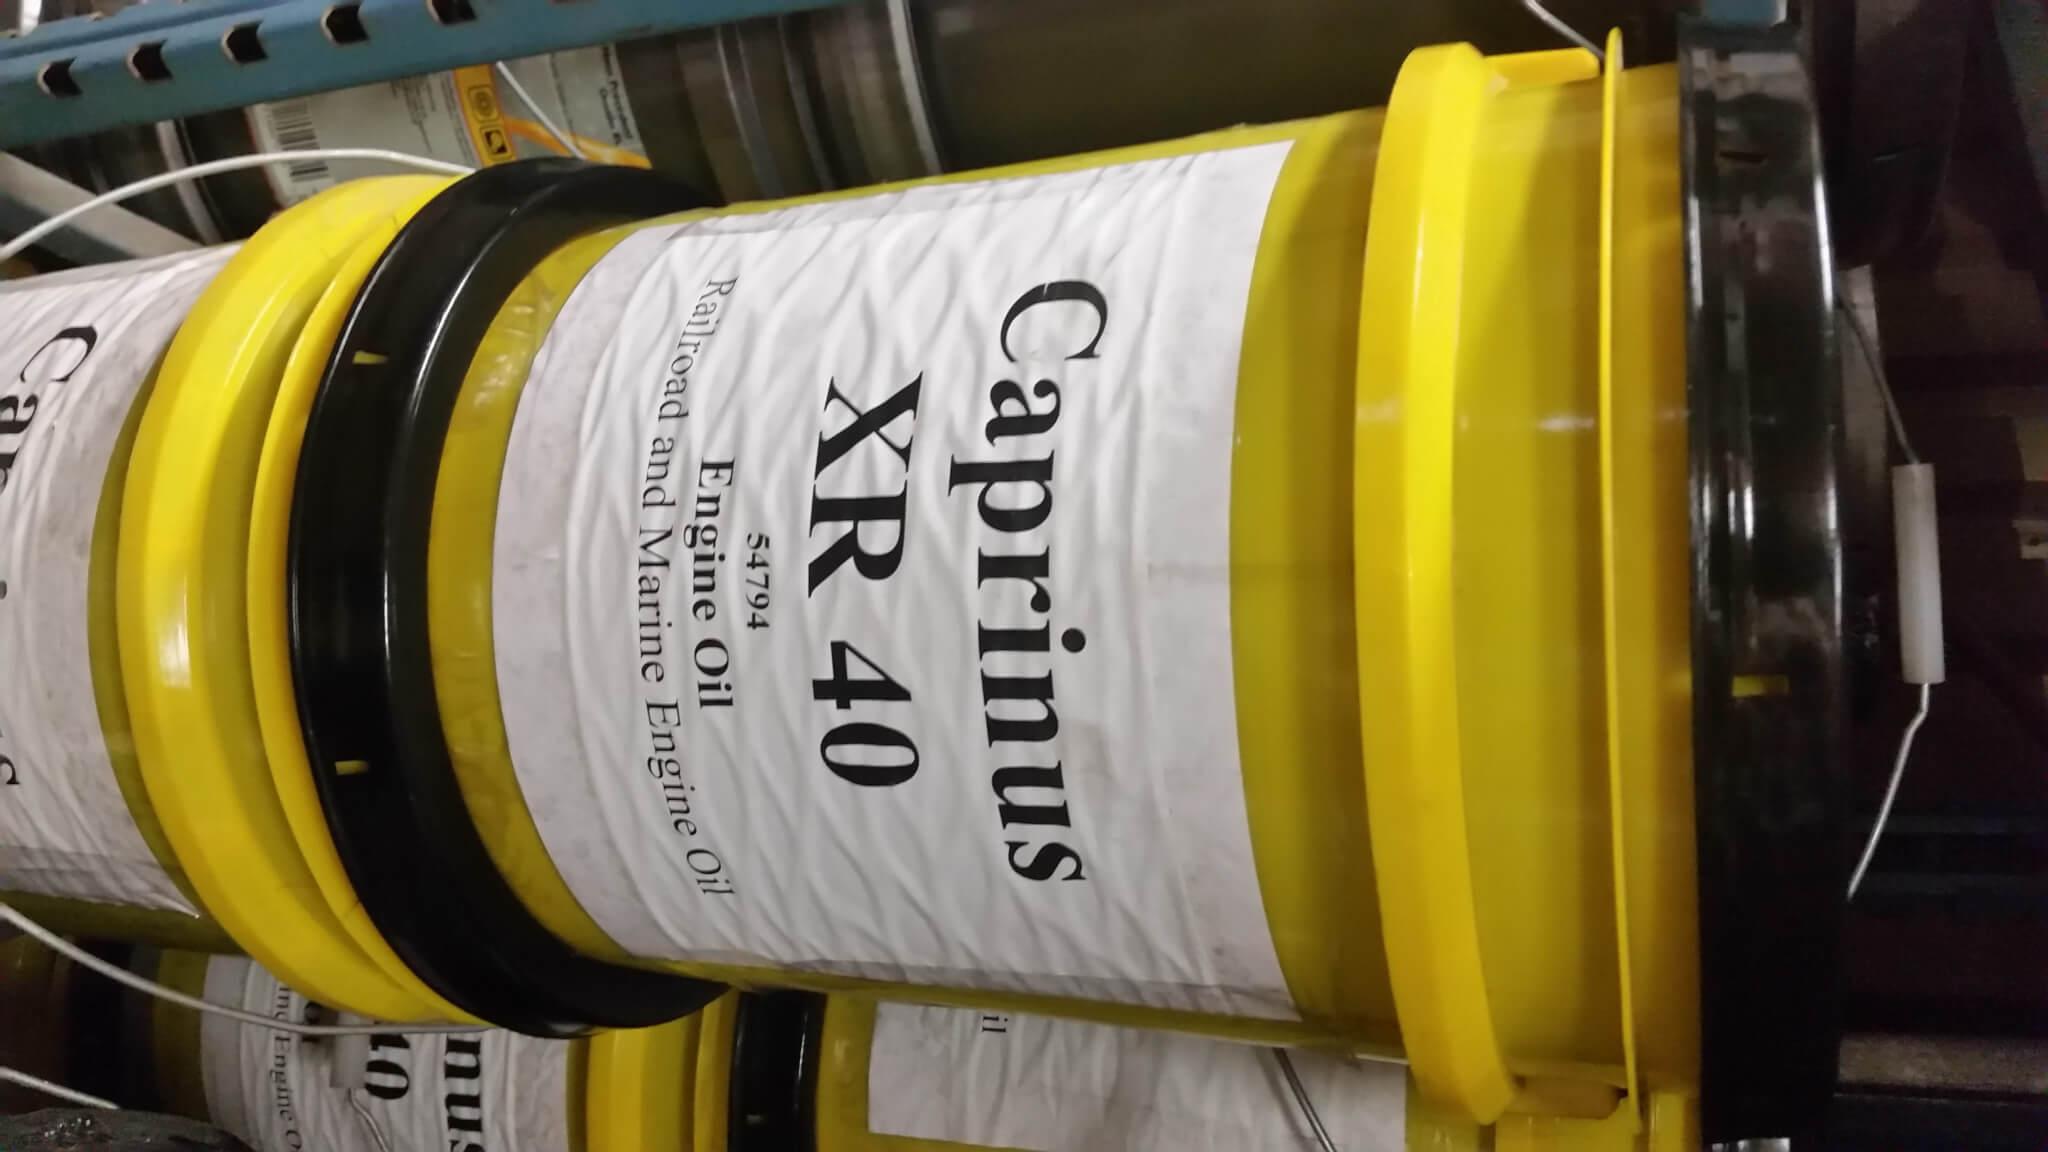 Caprinus XR 40 Railroad and Marine Engine Oil